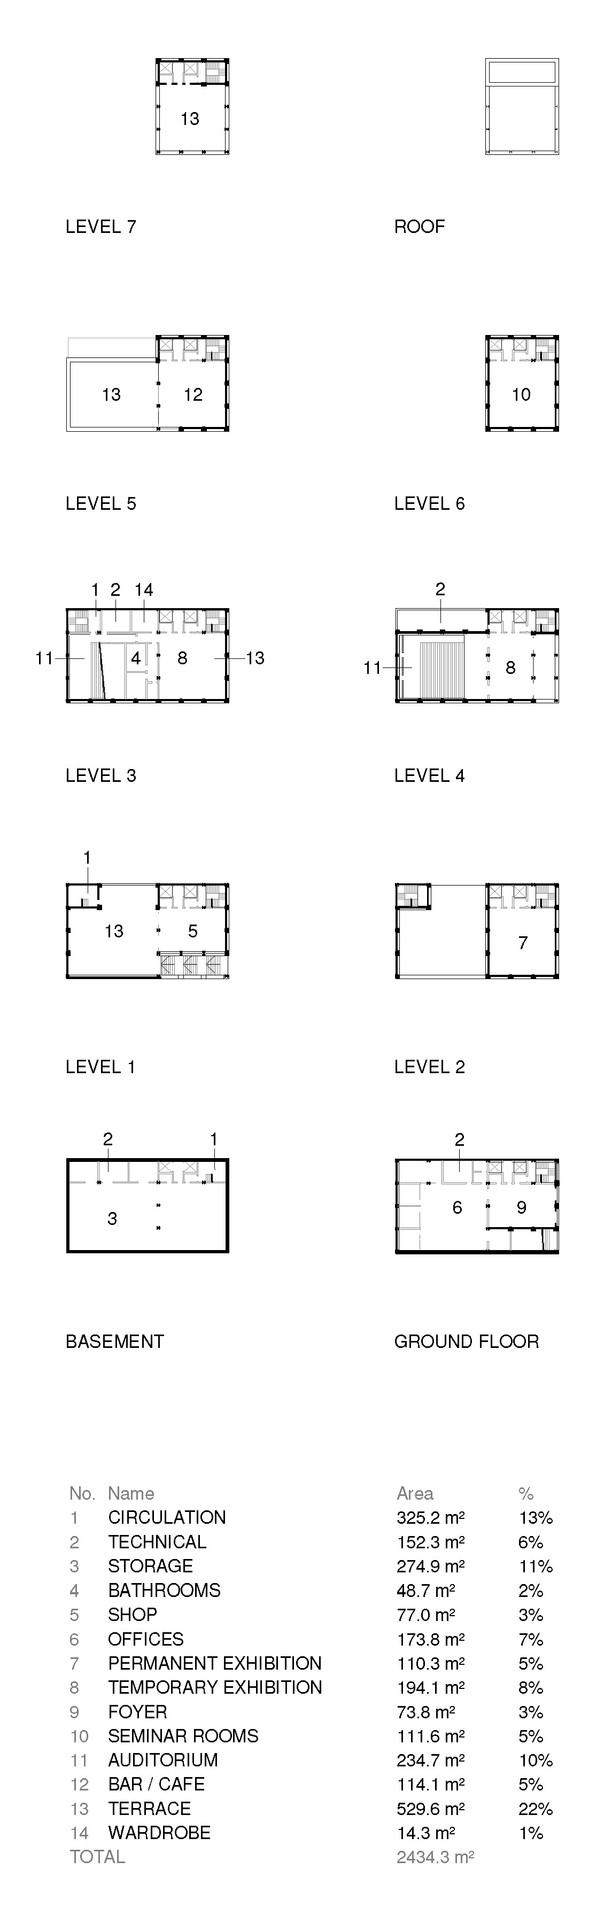 Building Program